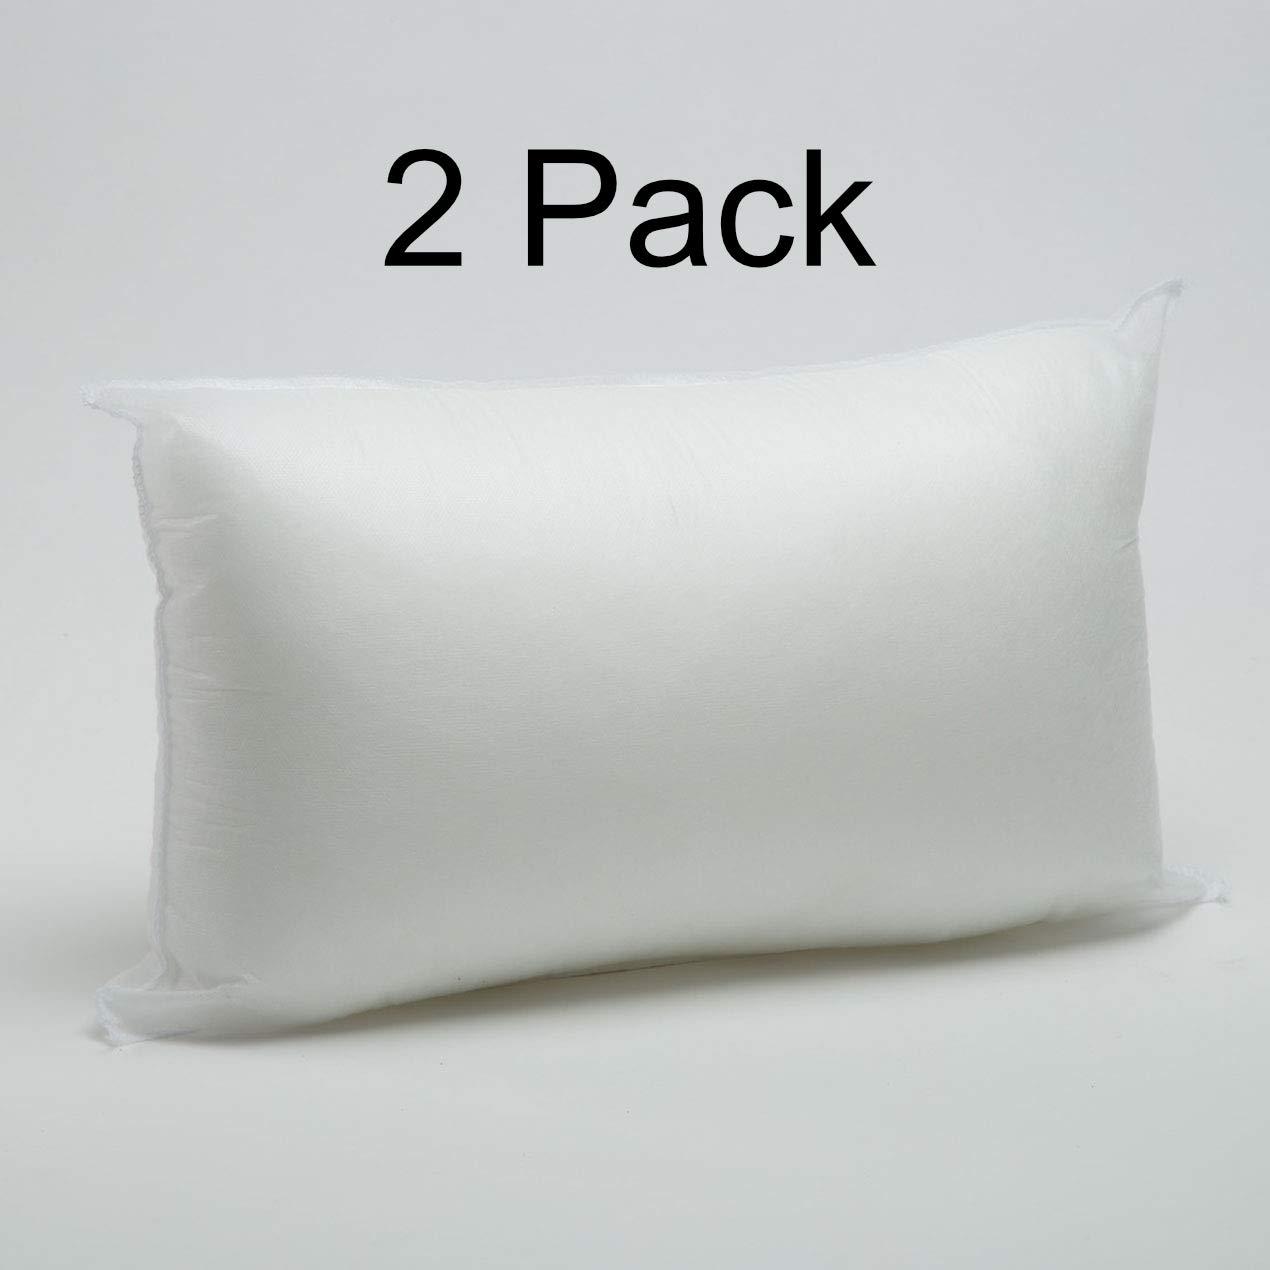 Foamily 2 Pack - 12'' x 20'' Premium Hypoallergenic Lumbar Stuffer Pillow Insert Sham Square Form Polyester, Standard/White by Foamily